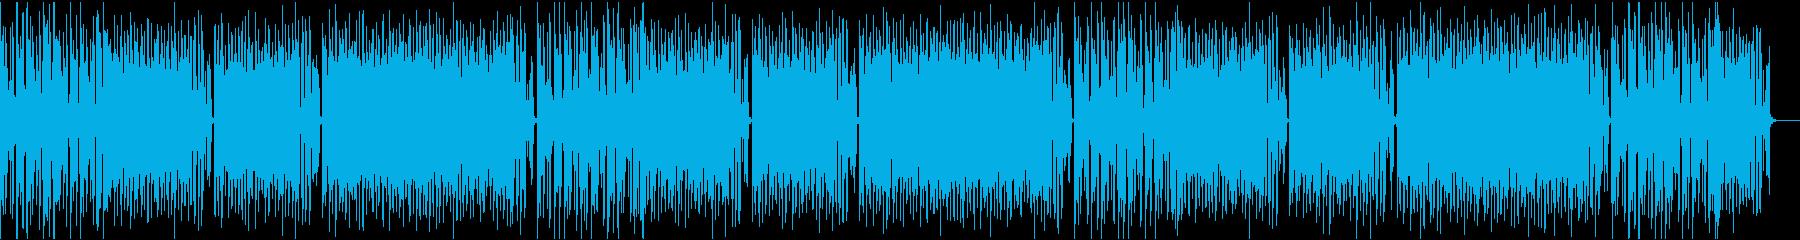 Comical / Karaoke's reproduced waveform